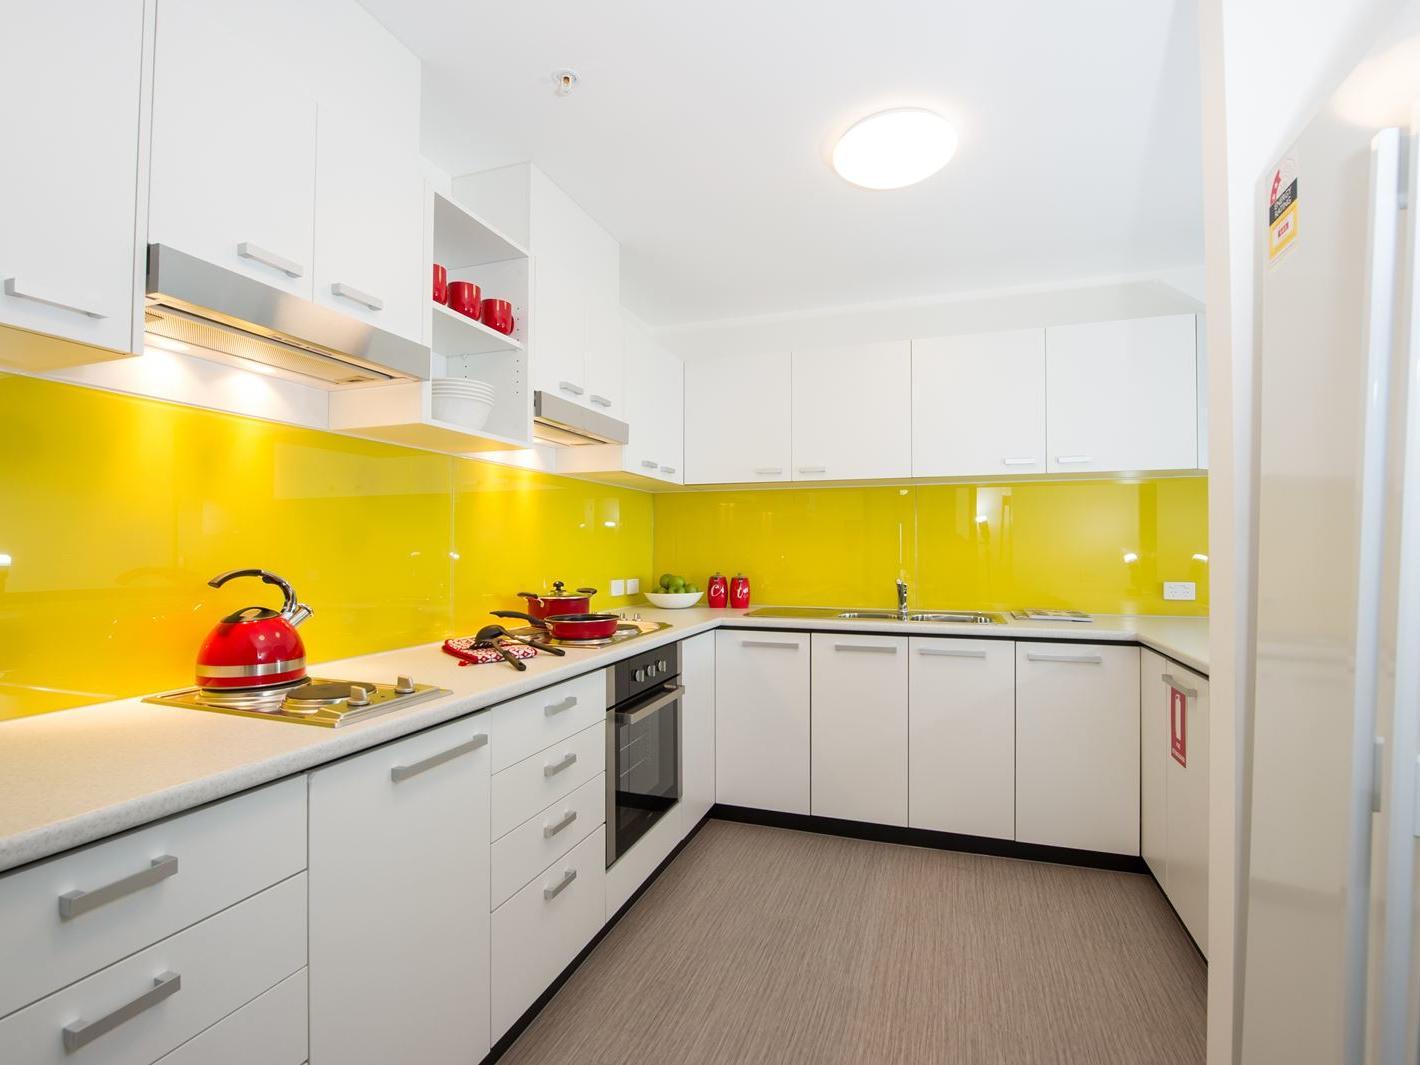 6 Bedroom Multishare Kitchen